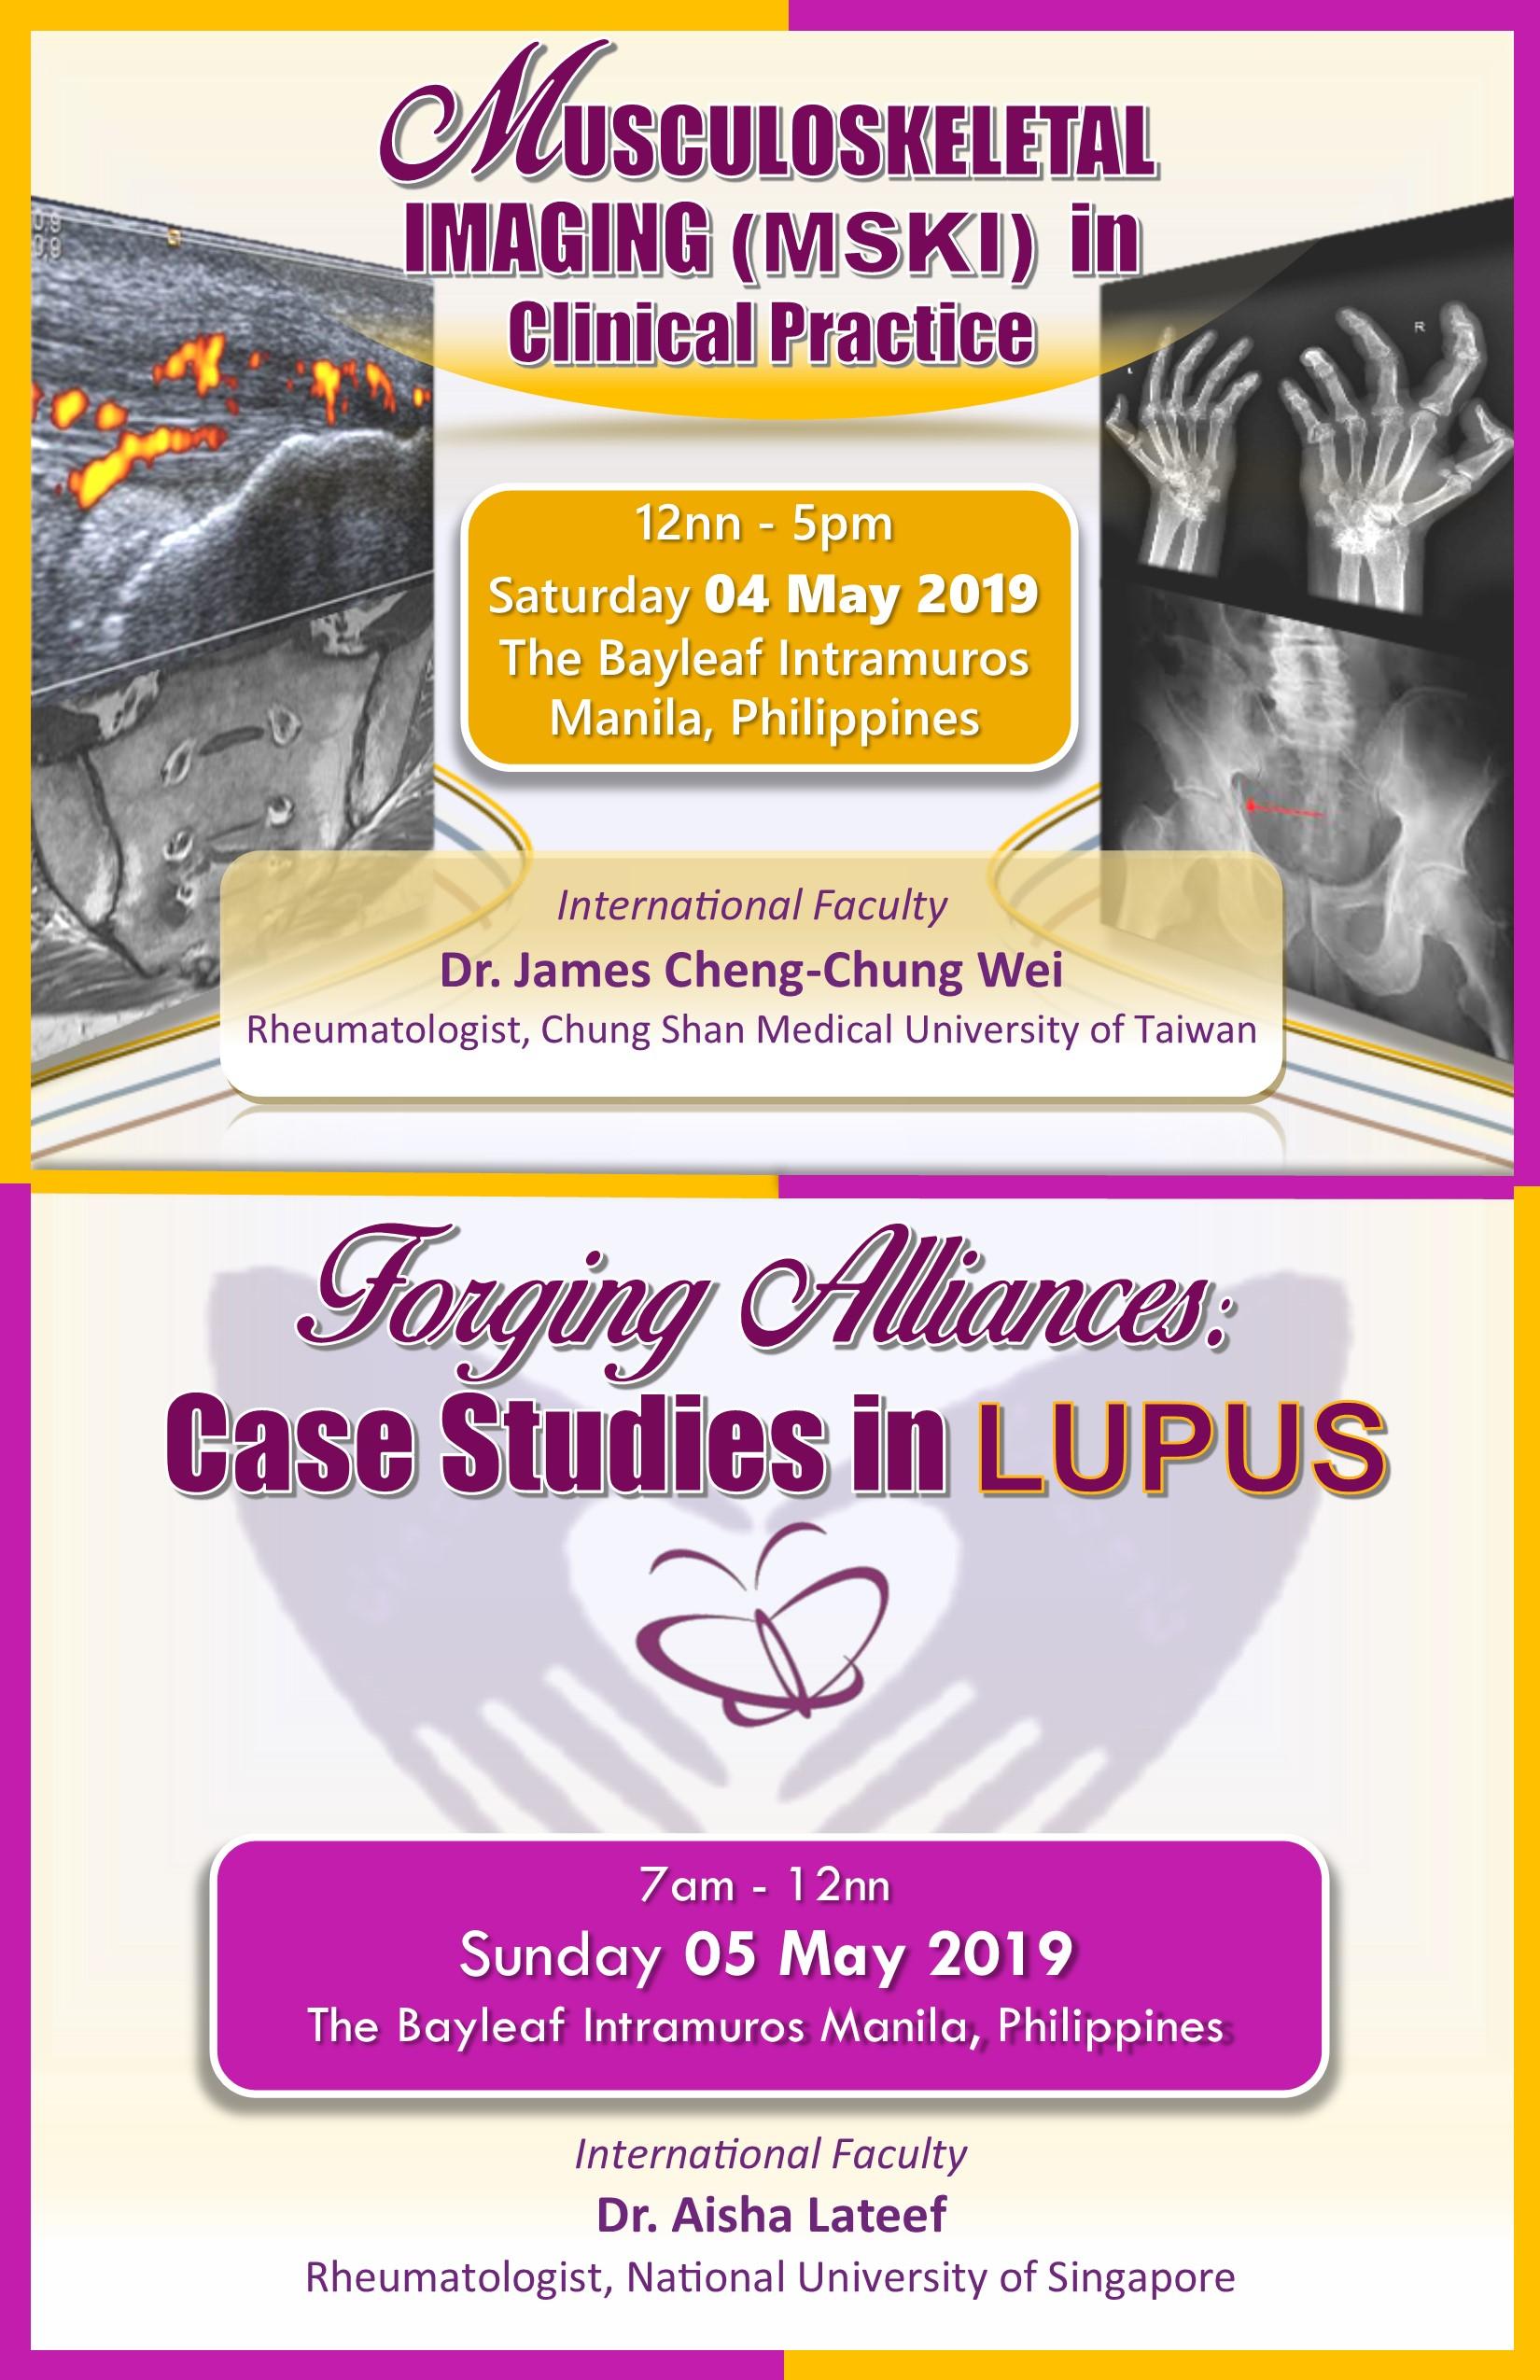 MSKI in Clinical Practice / Forging Alliances in LUPUS 2019